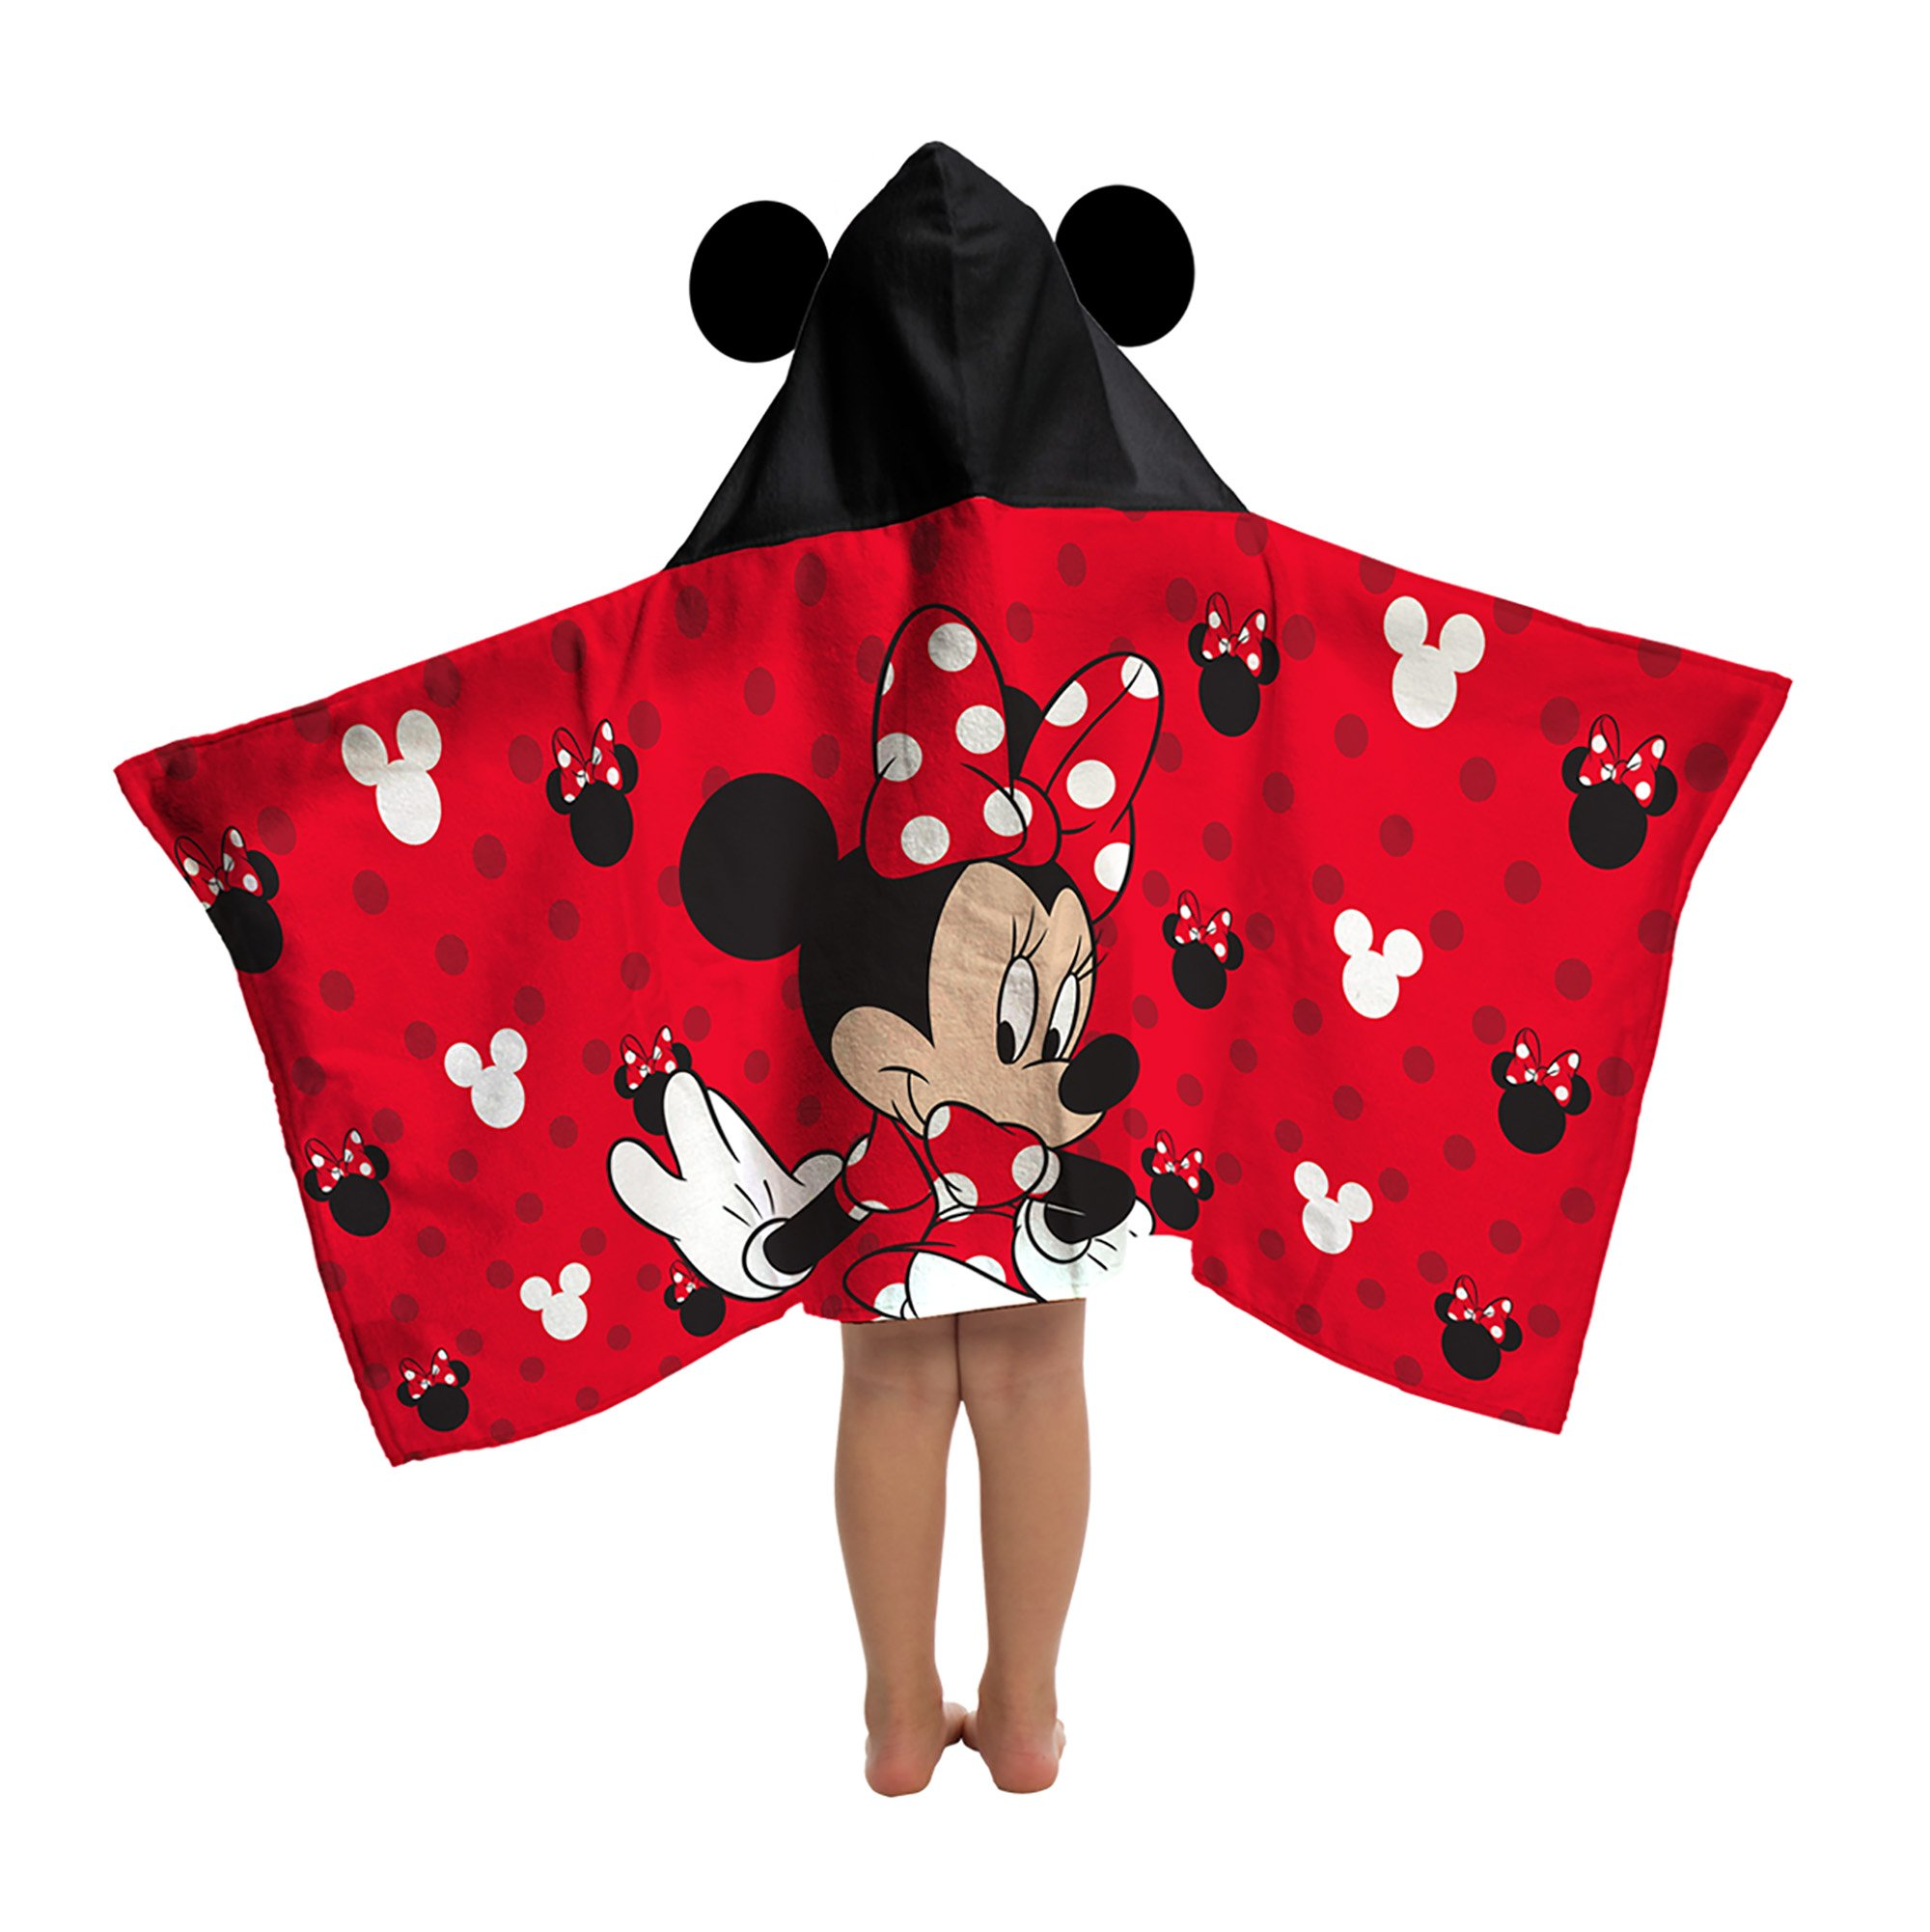 Disney Mickey Mouse/Minnie Mouse Love Cotton Hooded Cape Bath/Pool/Beach Towel